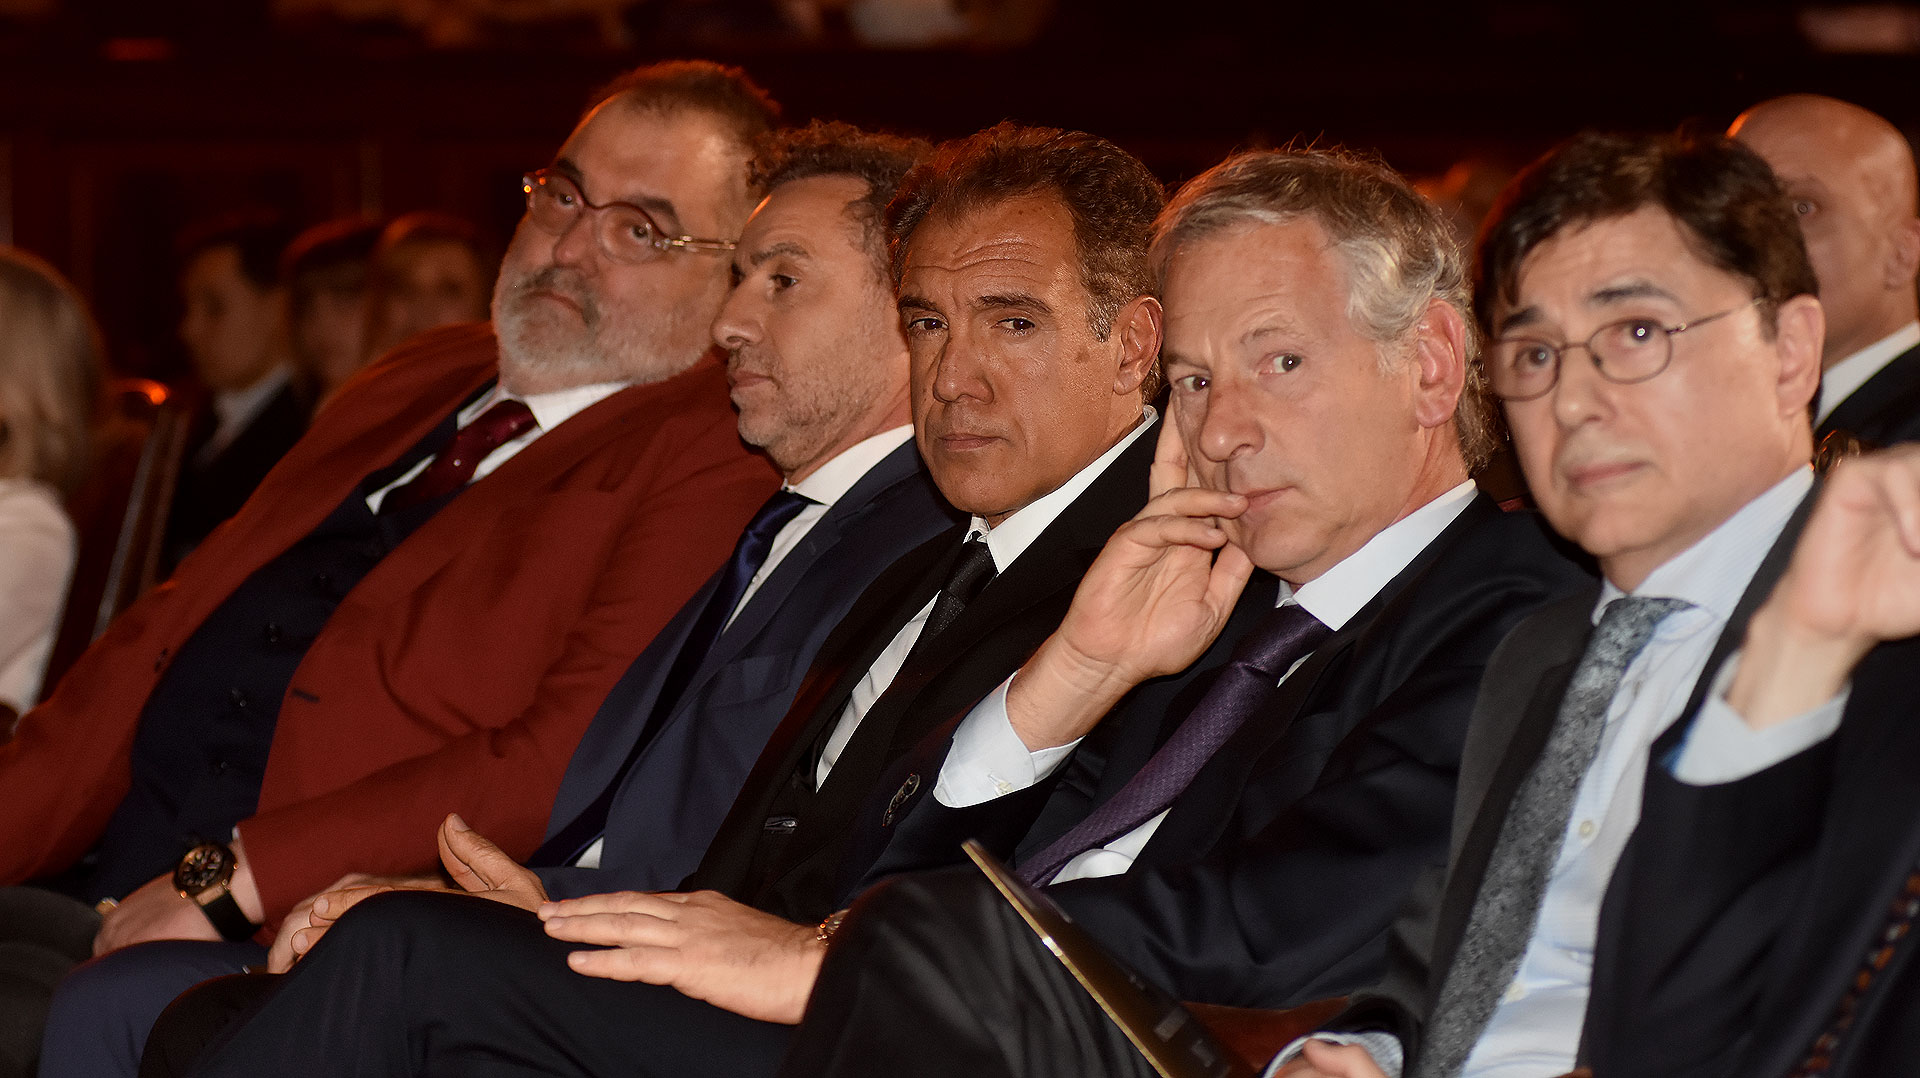 Jorge Lanata, Luis Majul, Daniel Hadad, Marcelo Longobardi y Jorge Fontevecchia